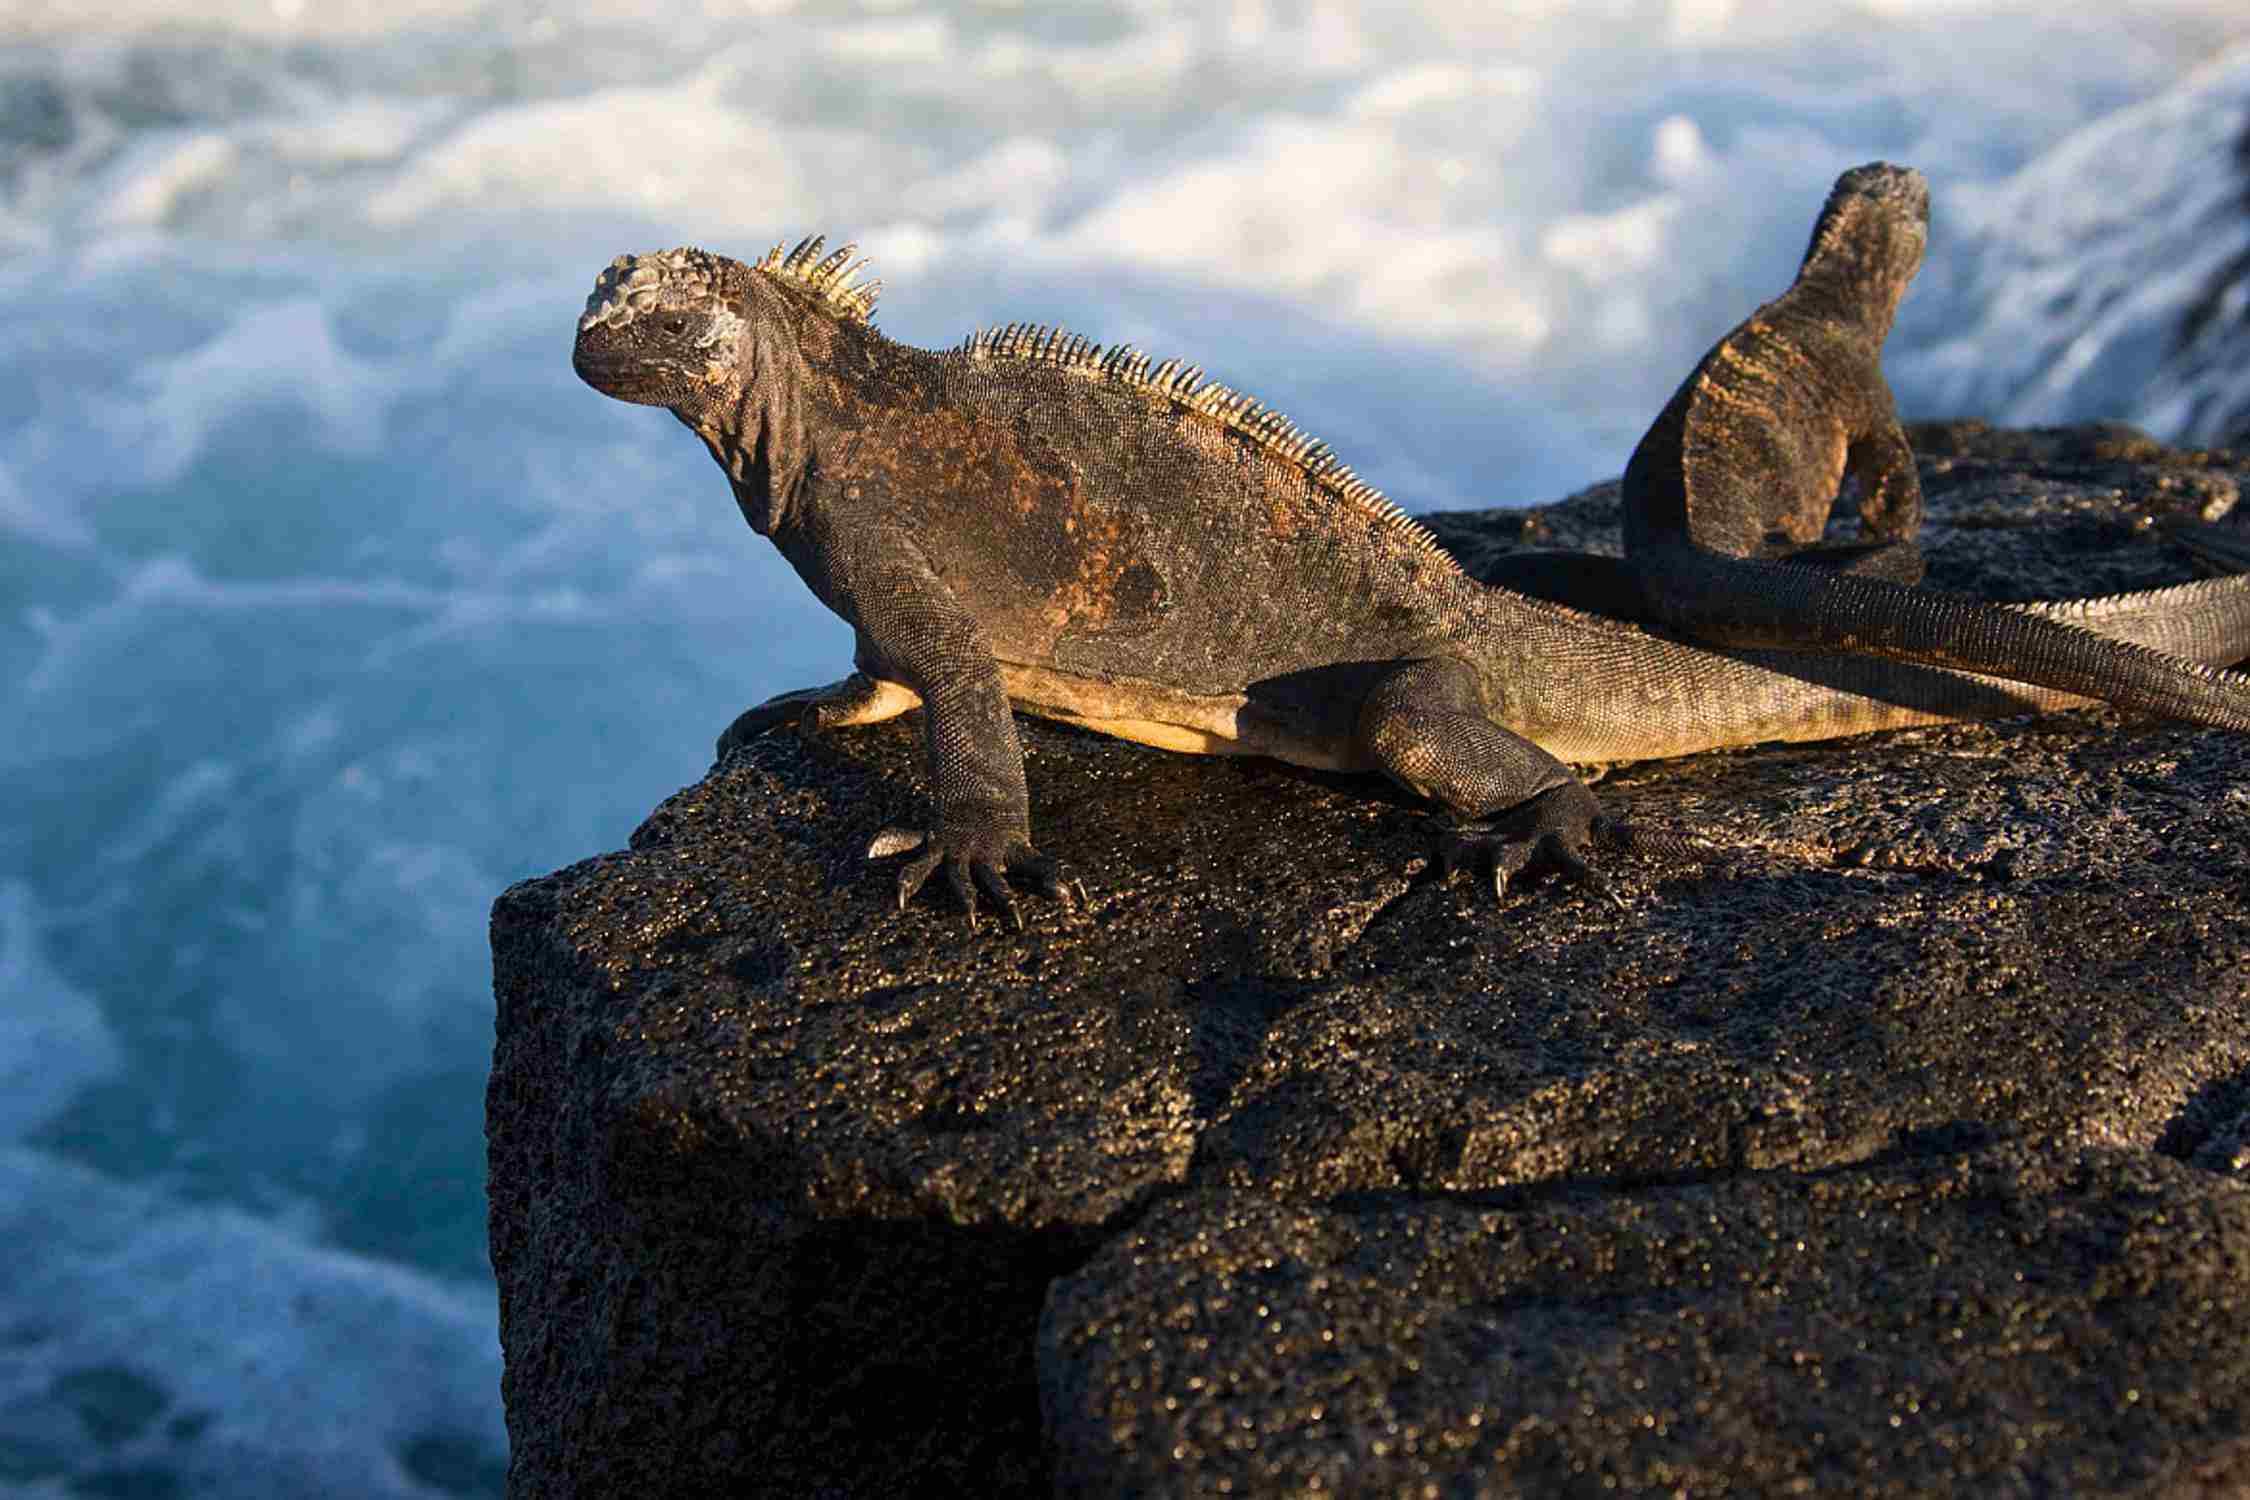 Marine iguana - Amblyrhynchus cristatus